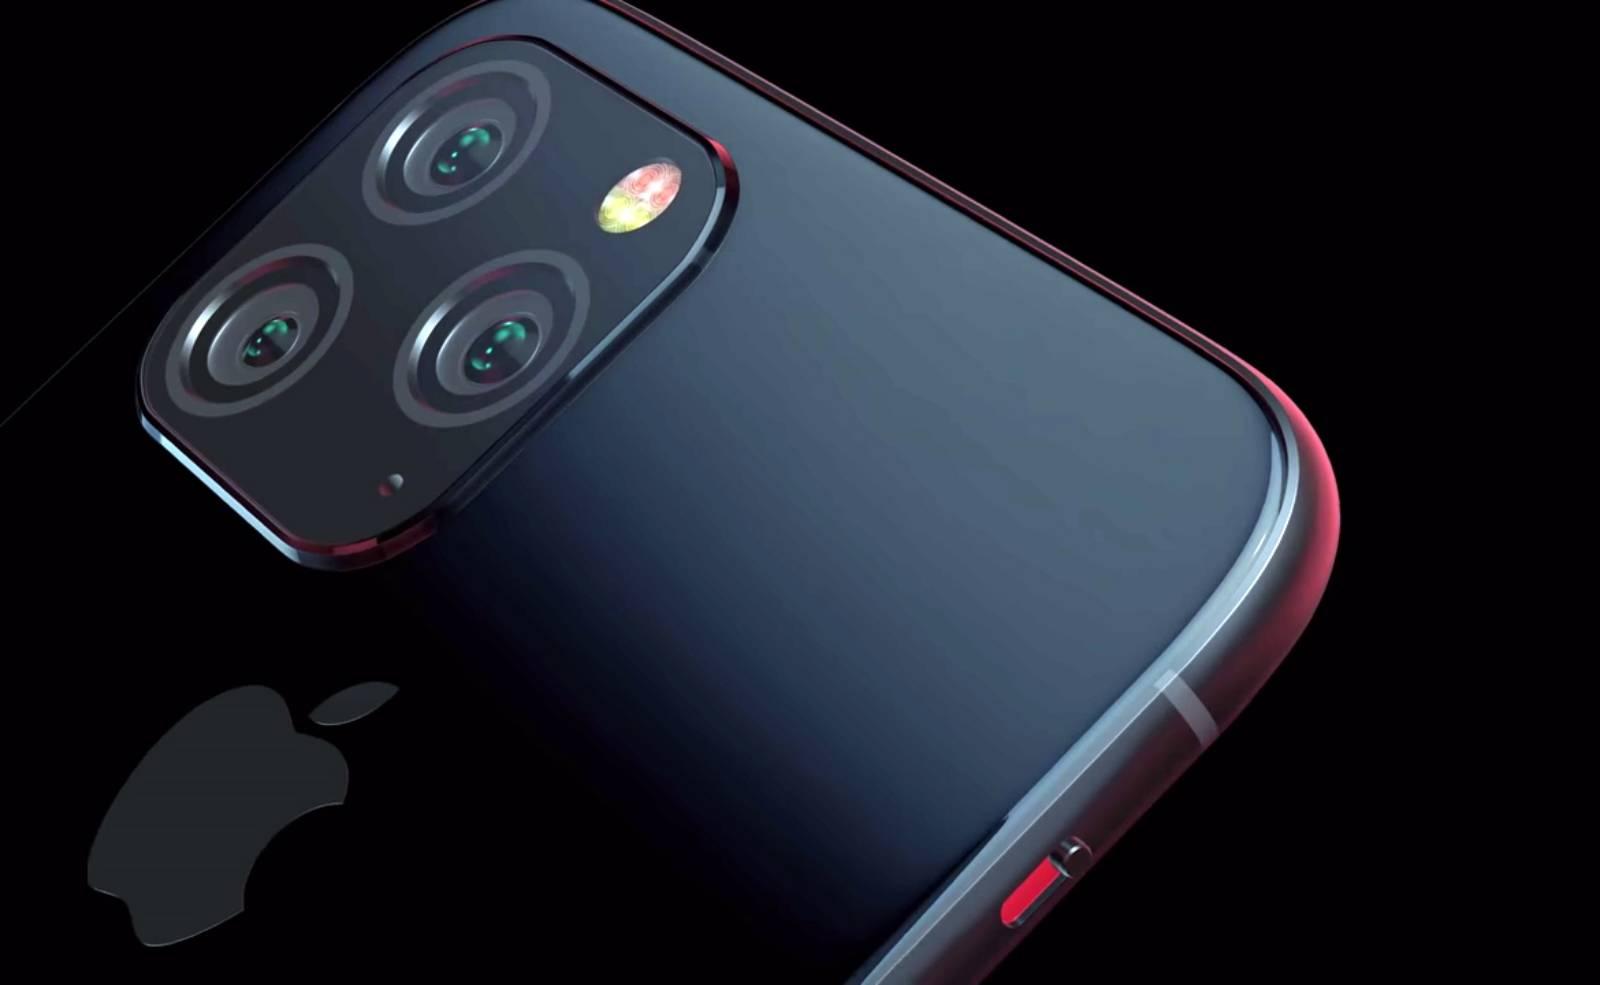 iPhone 11 interes 5g